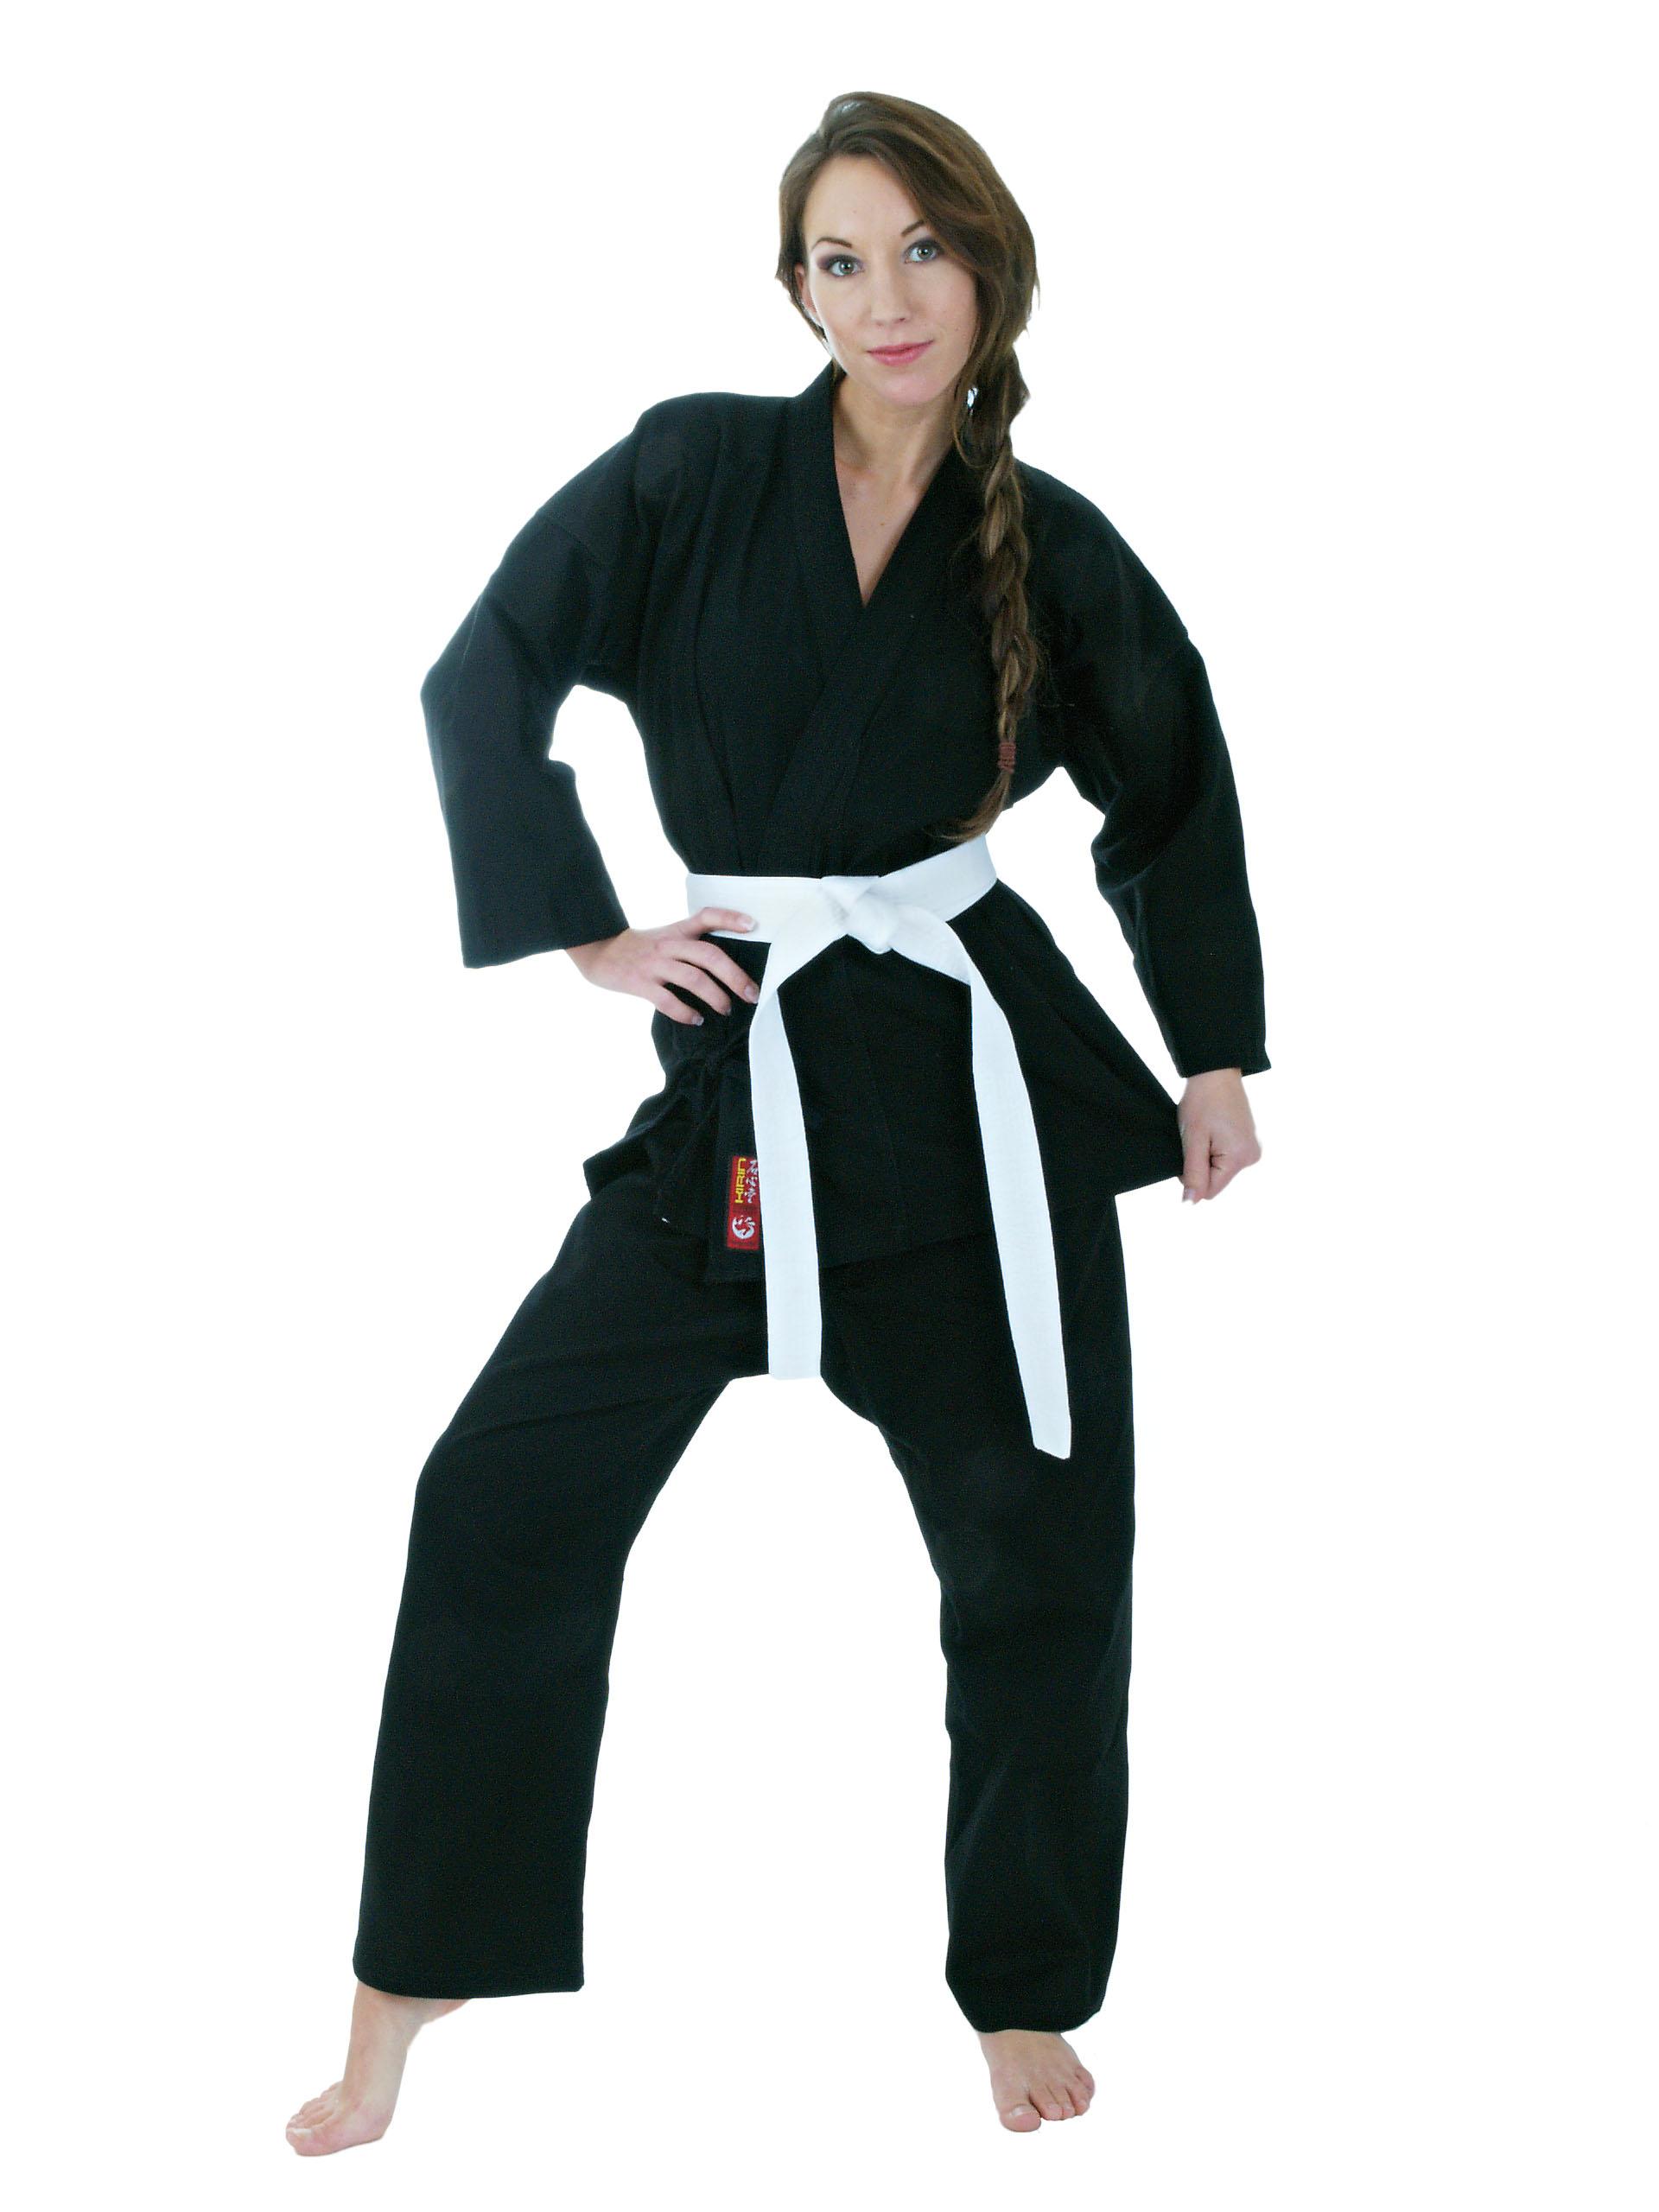 Ju Jutsu Anzug ALLSTYLE schwarz//170cm Hayashi.SV Jiu Jitsr,Grappling,usw Judo